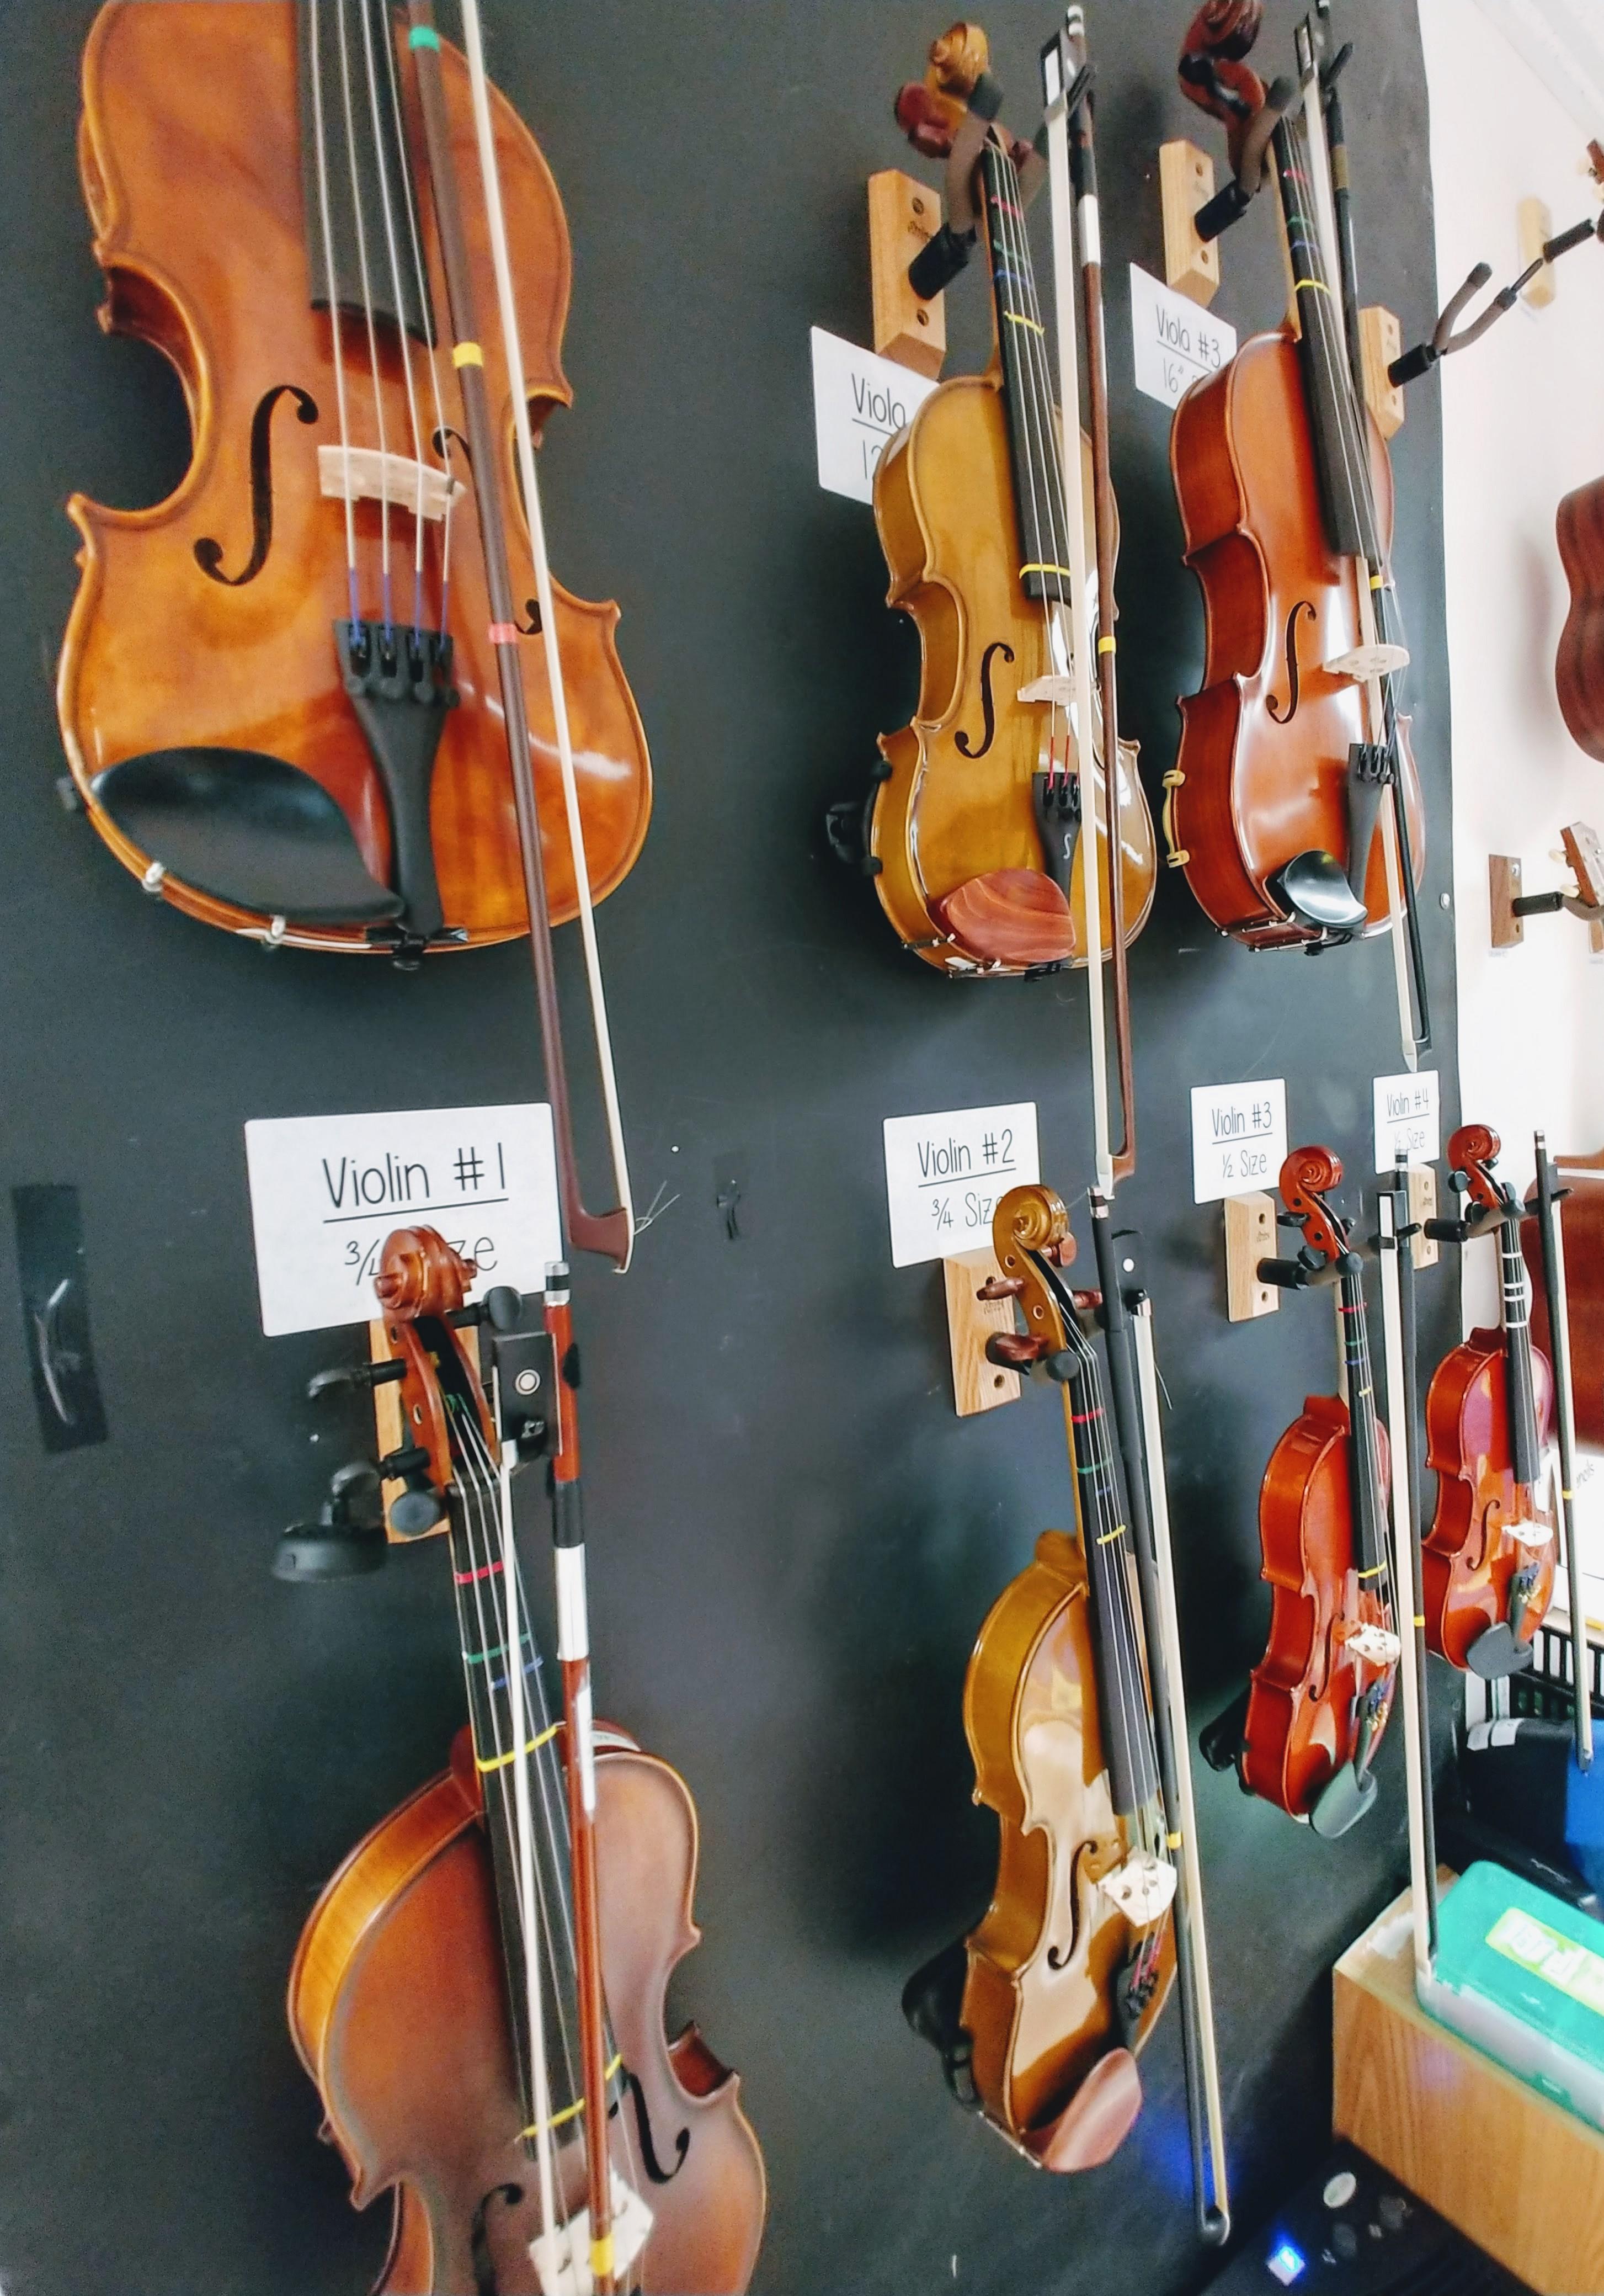 Student Violins and Violas